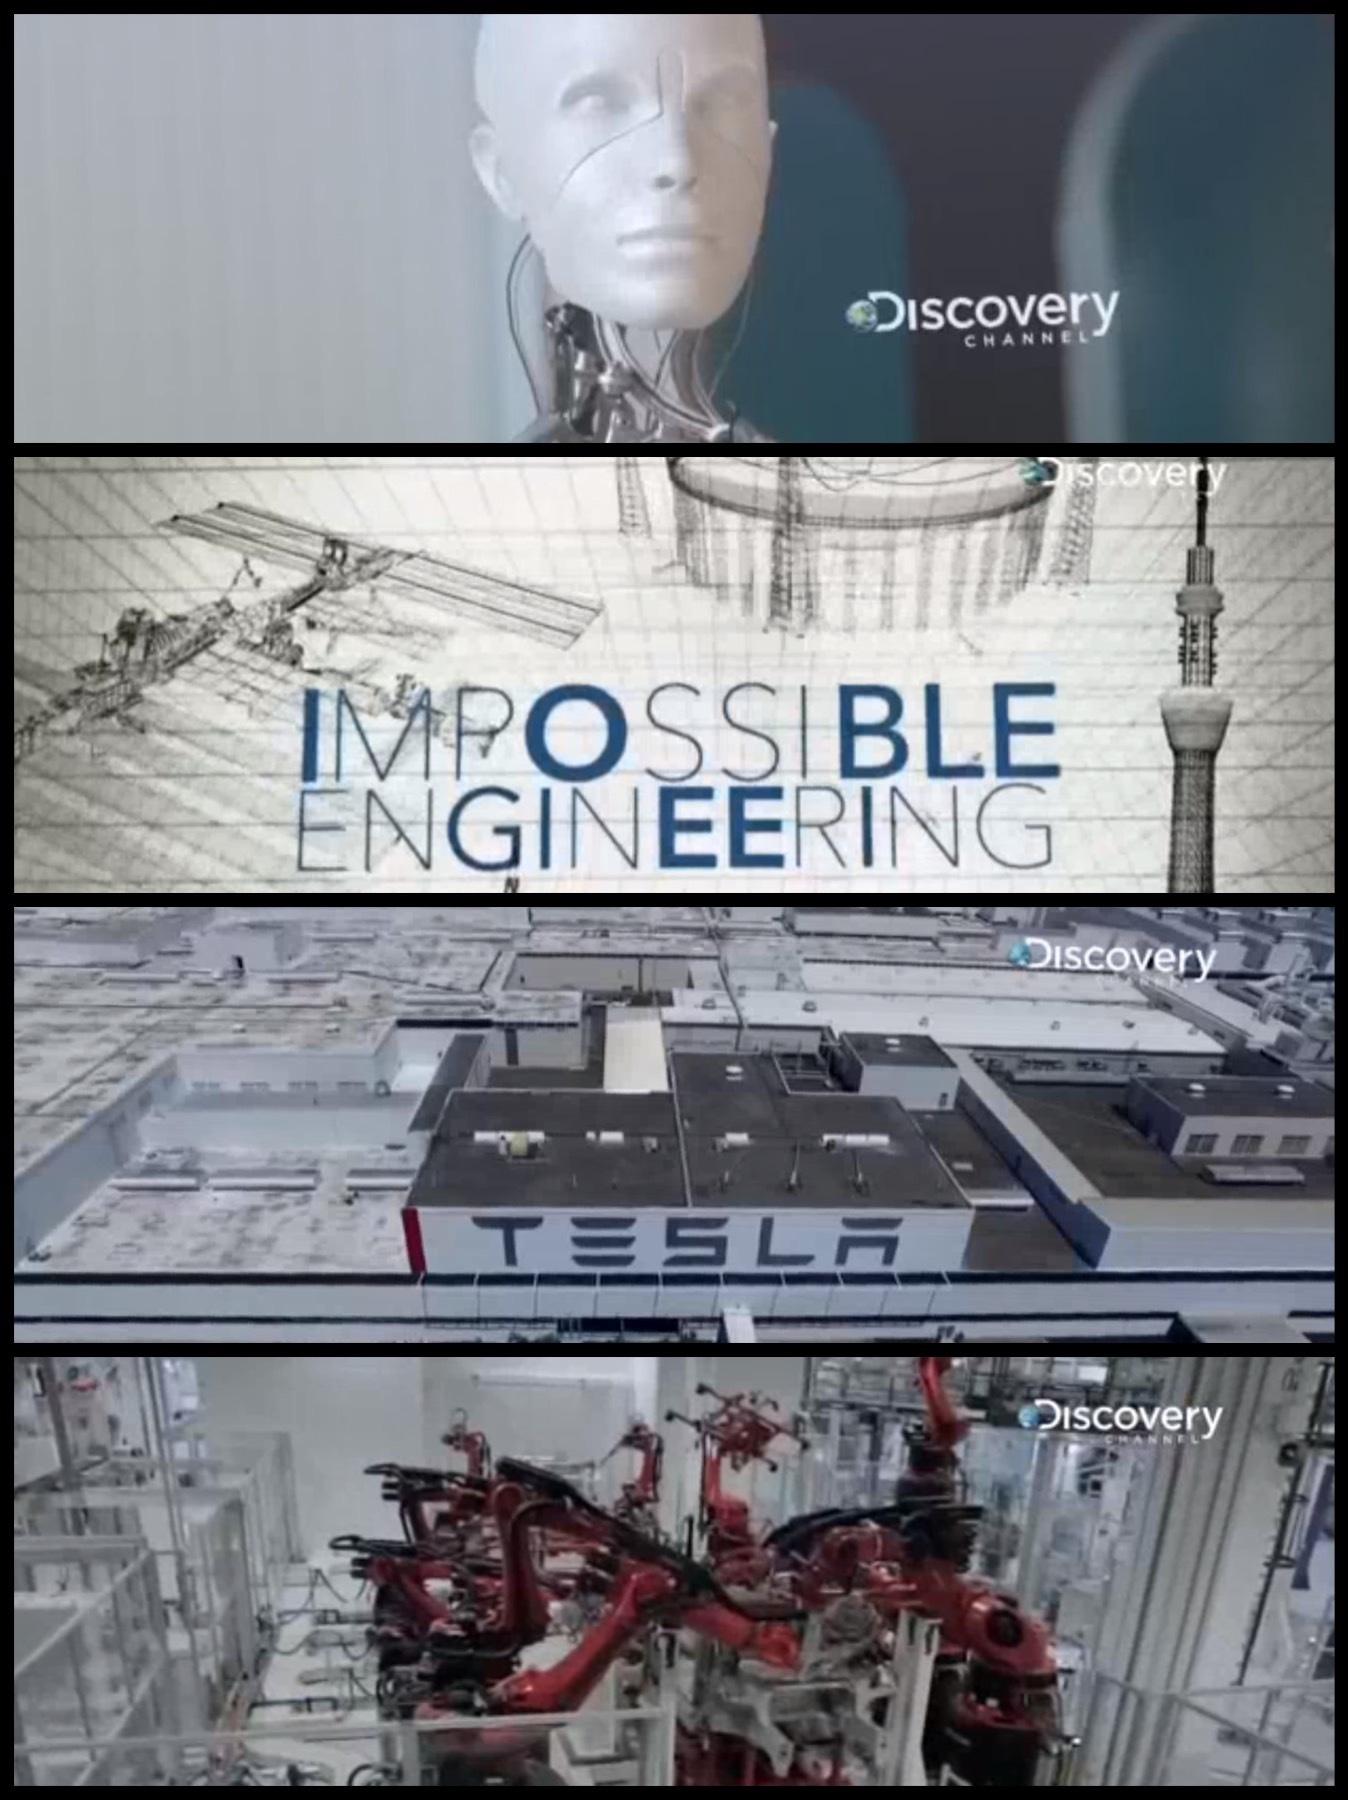 Discovery CHANNELの番組「メガ建造 テスラ・ファクトリー」